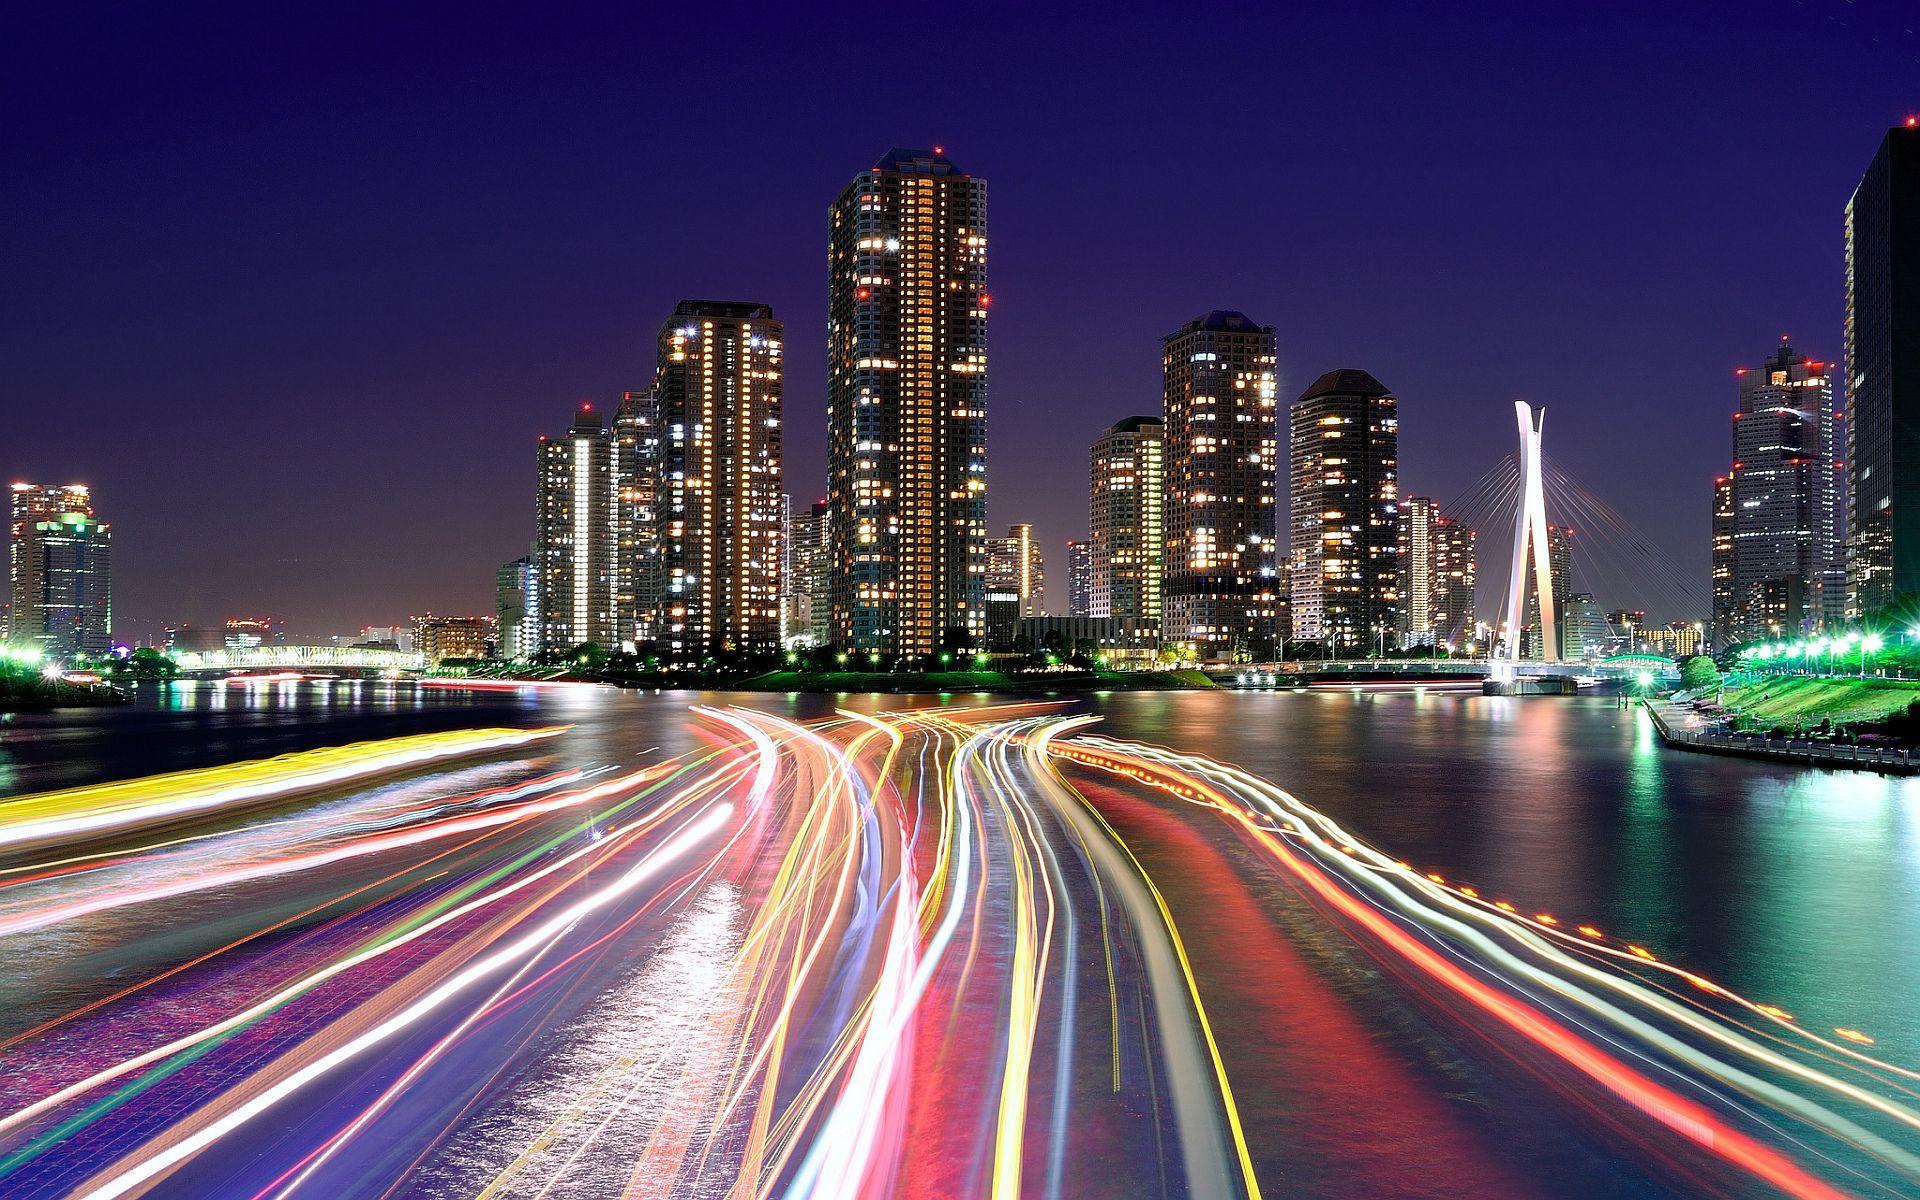 Bulb Tokyo Night - Bulb Tokyo Night